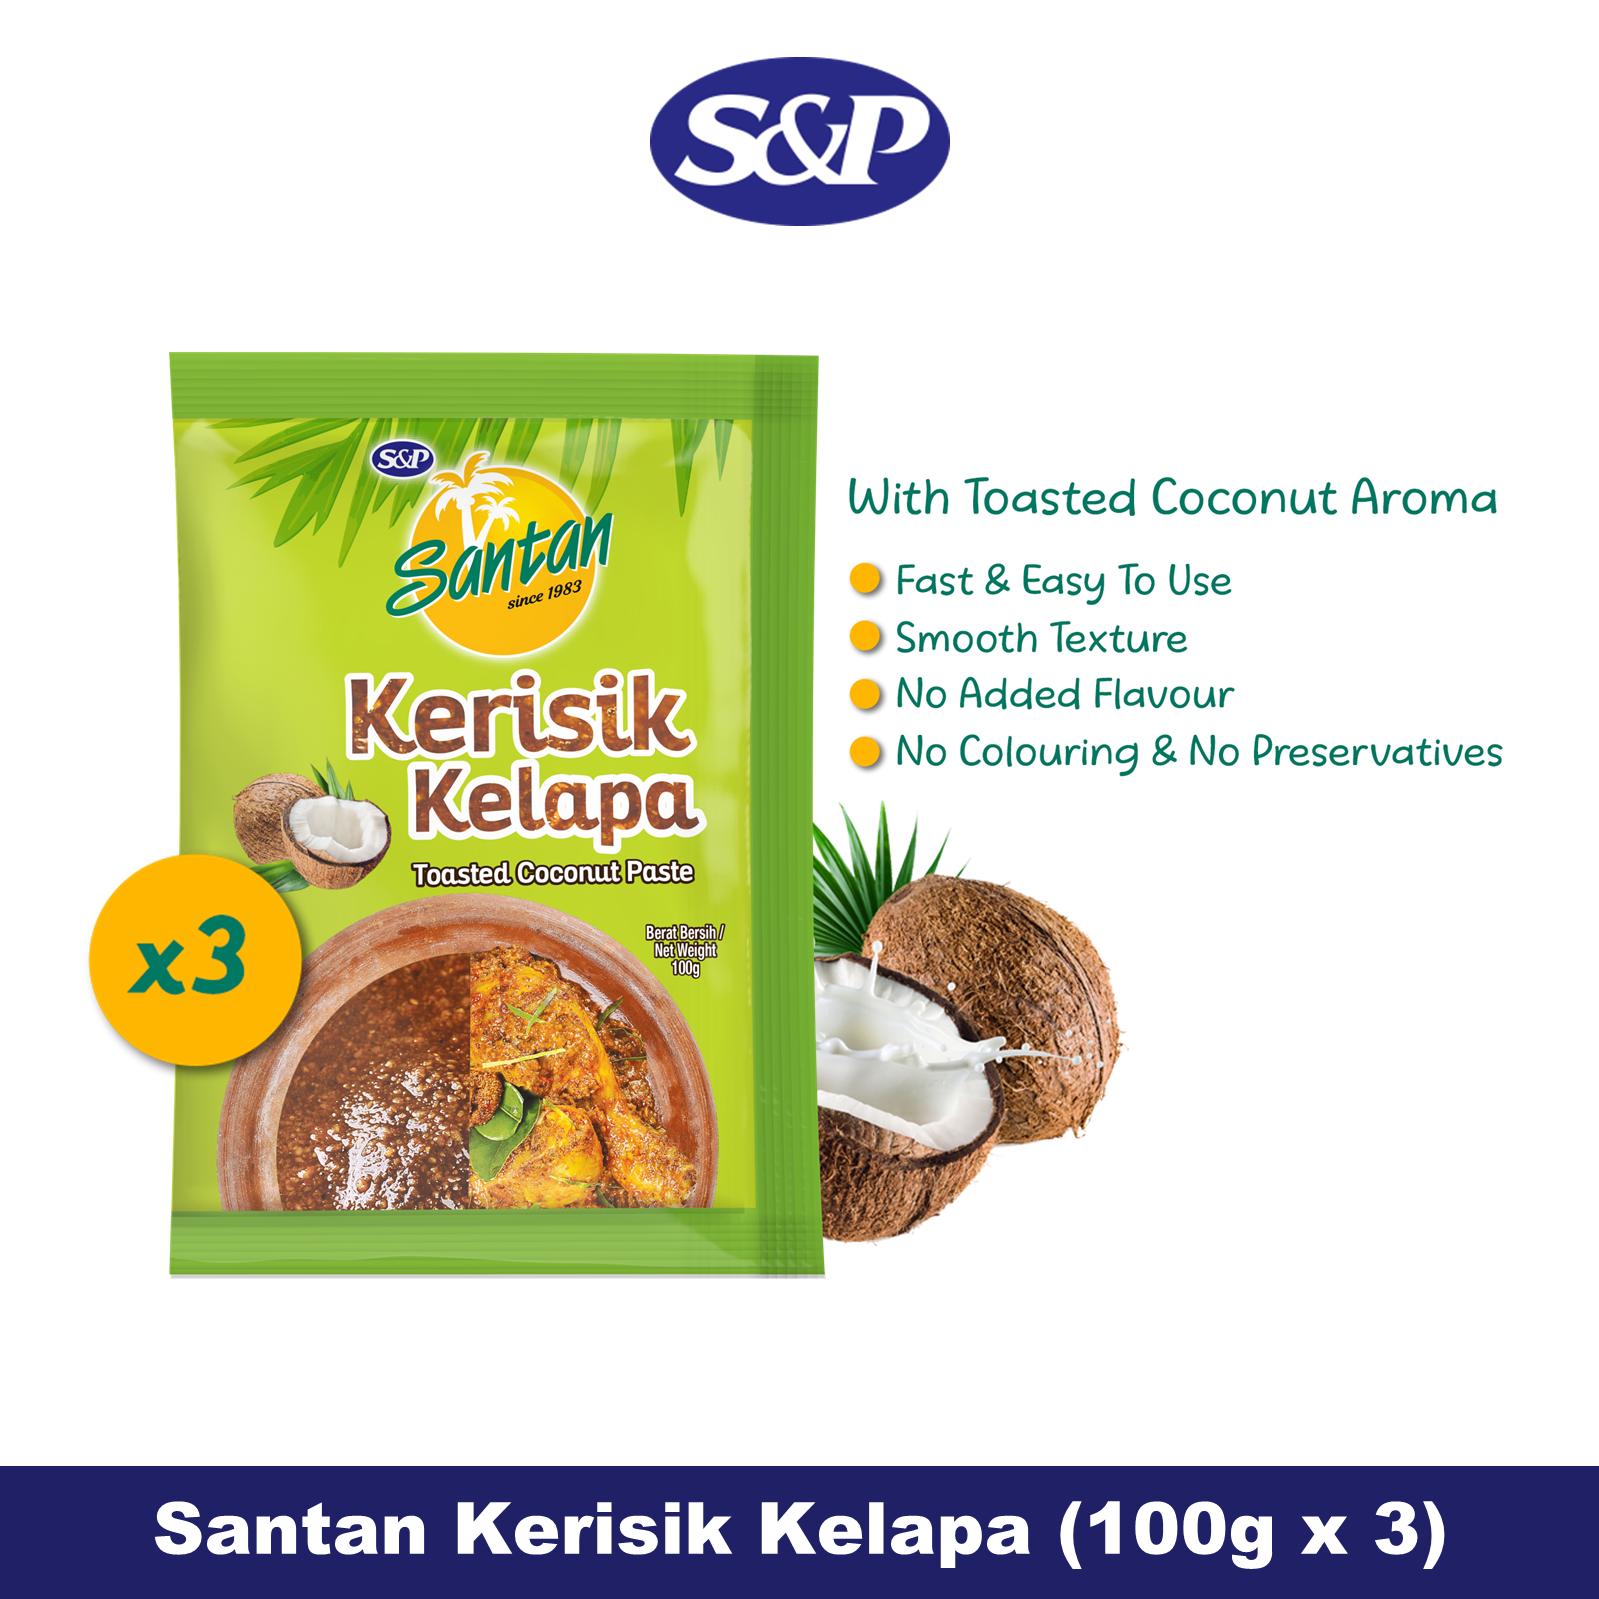 S&P Santan Coconut Paste Kerisik Kelapa (100g x12)